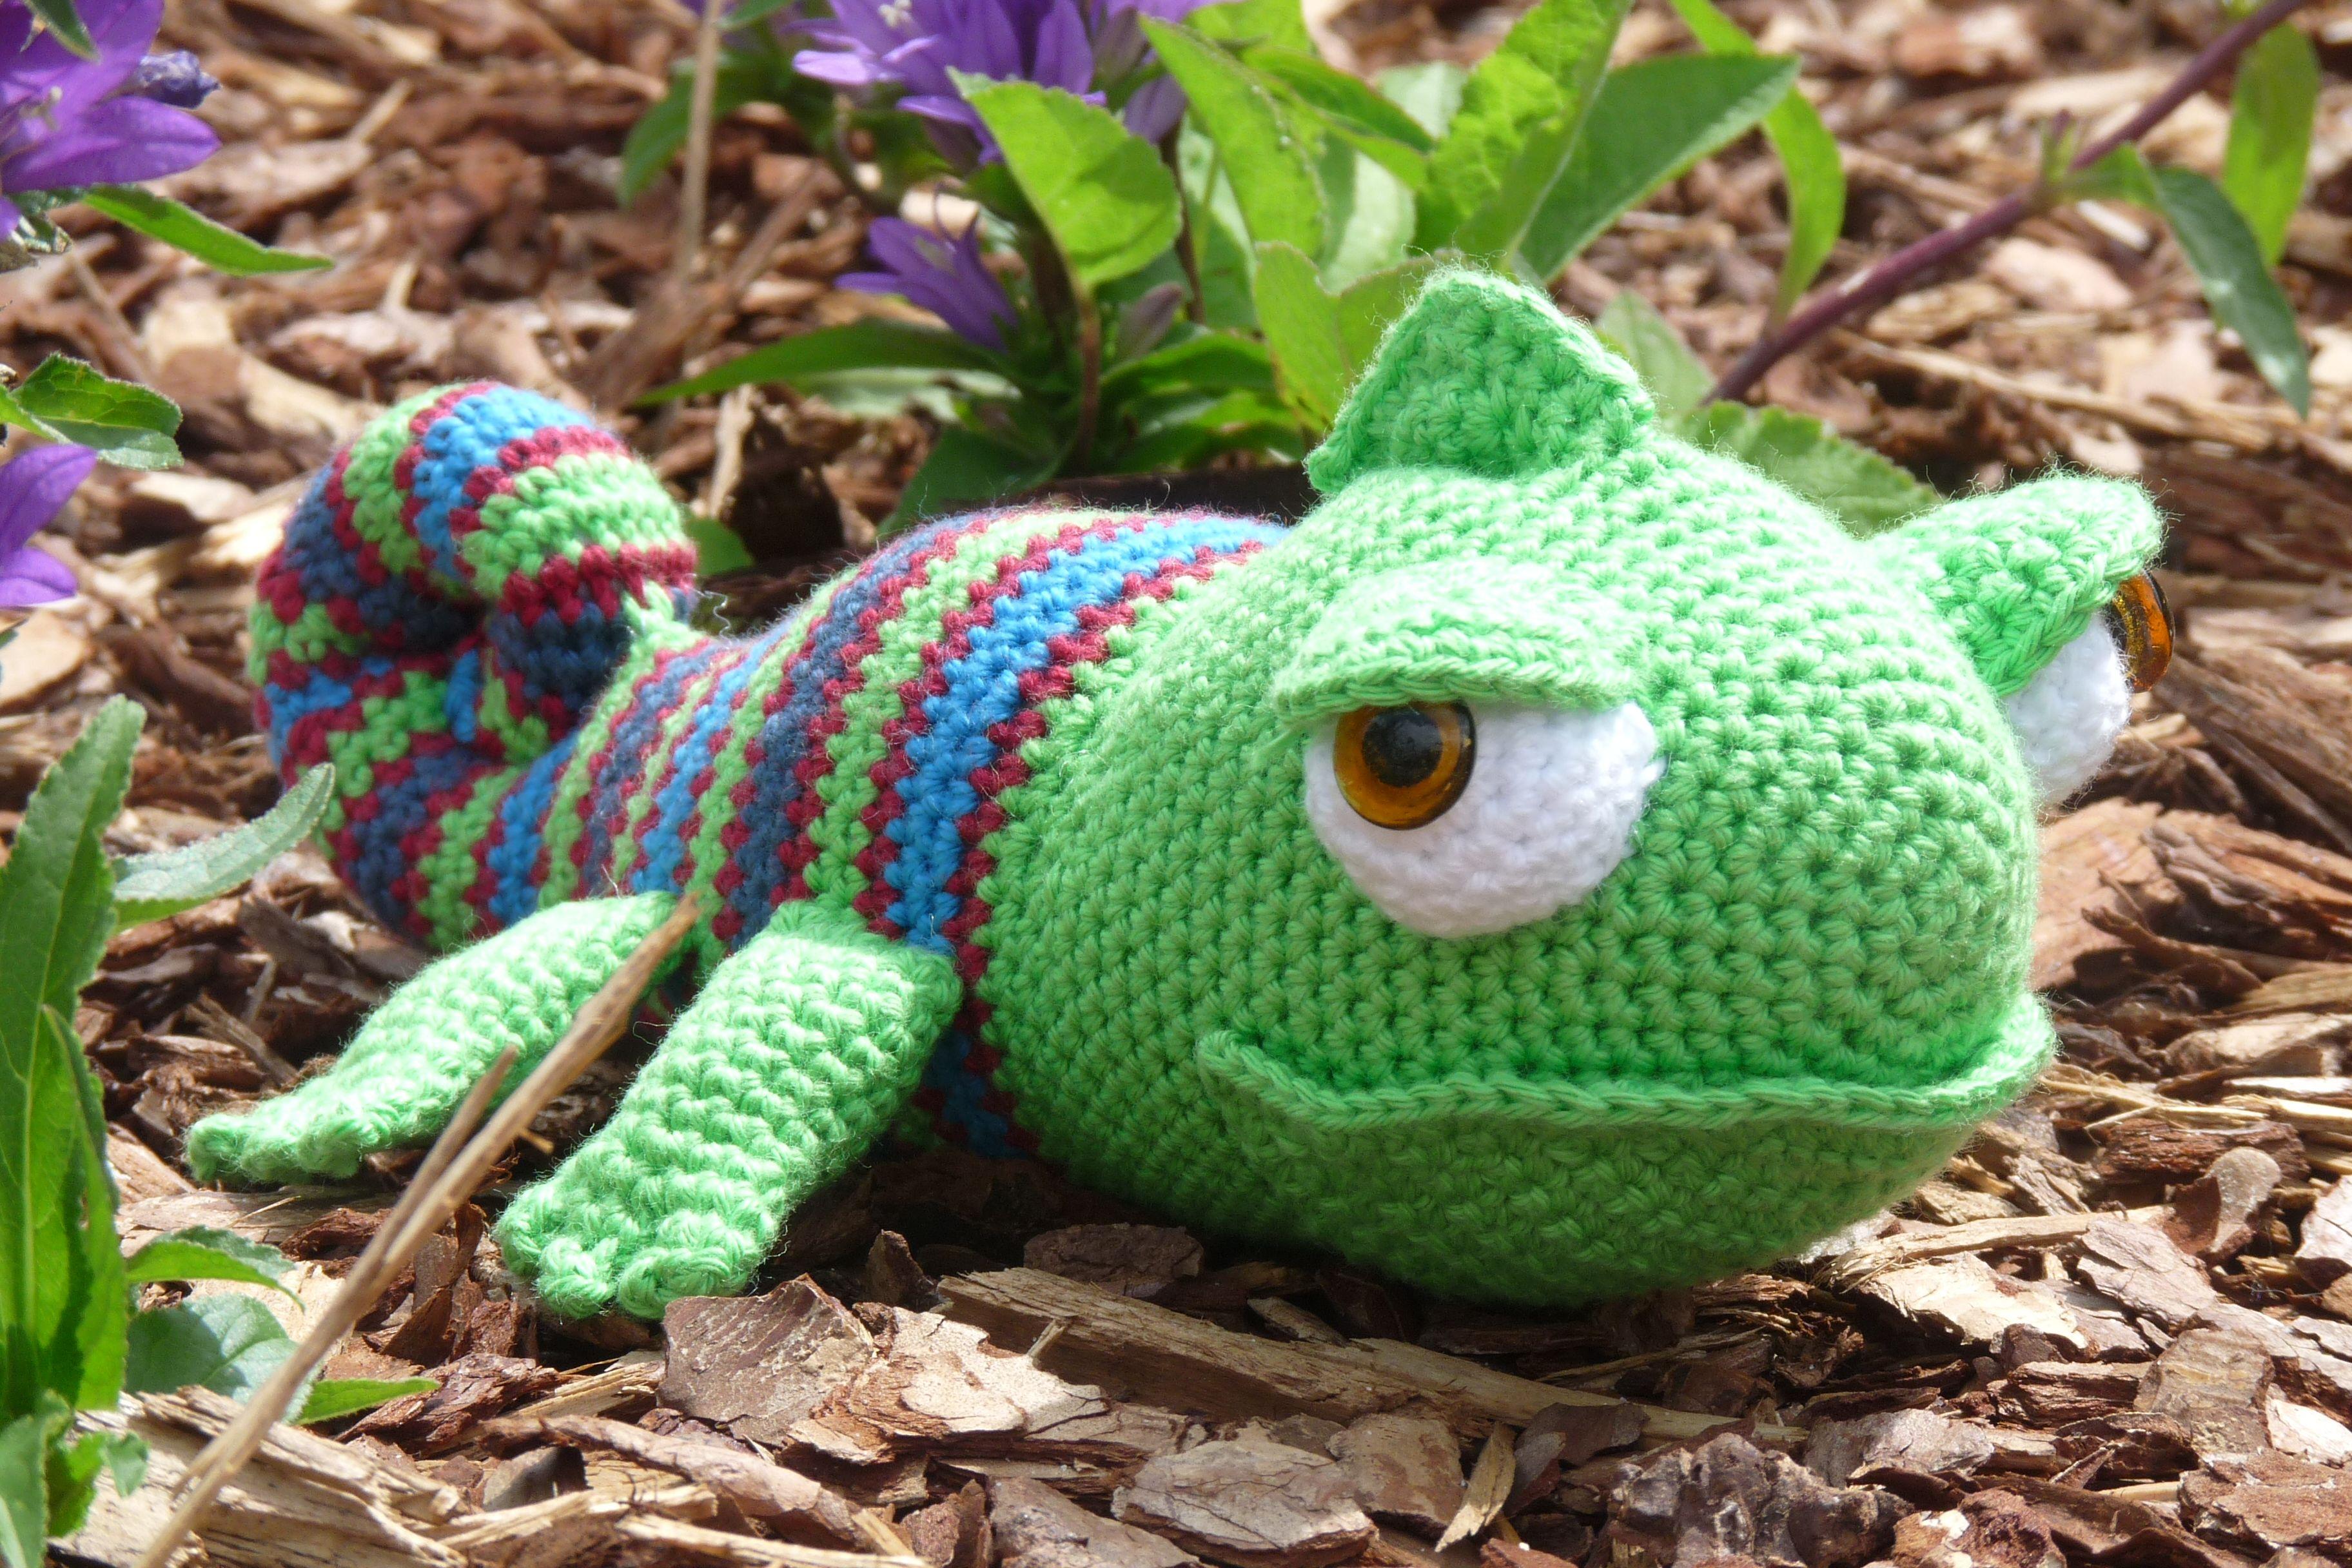 Karen Kameleon Patroon Kleine Knuffels Haken Christel Krukkert